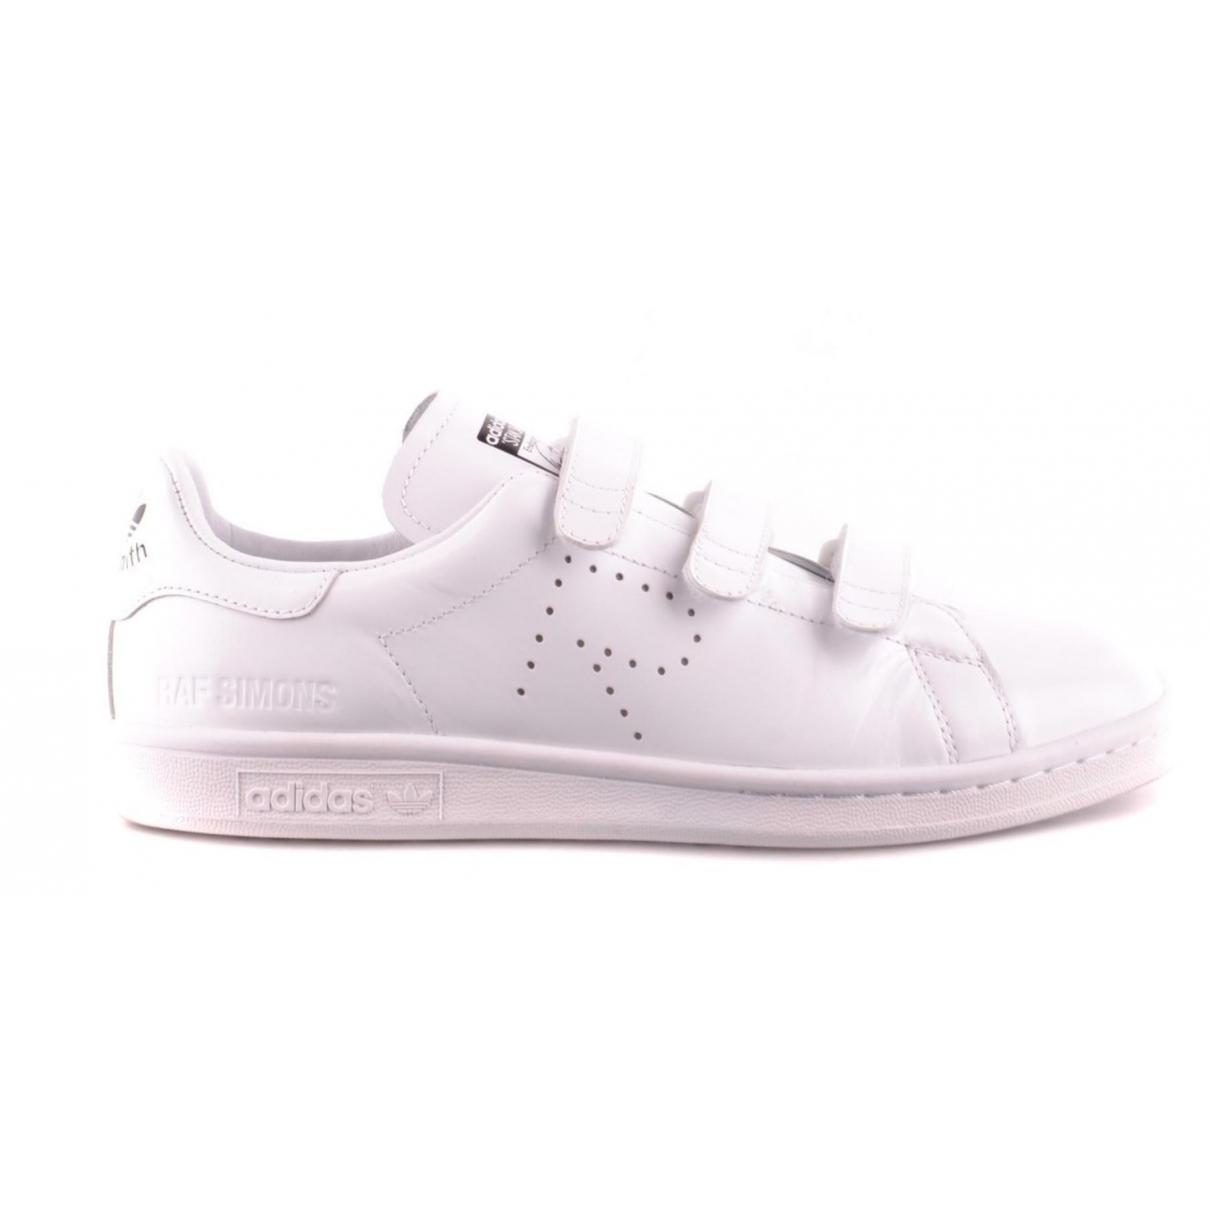 Adidas X Raf Simons - Baskets Stan Smith pour femme en cuir - blanc